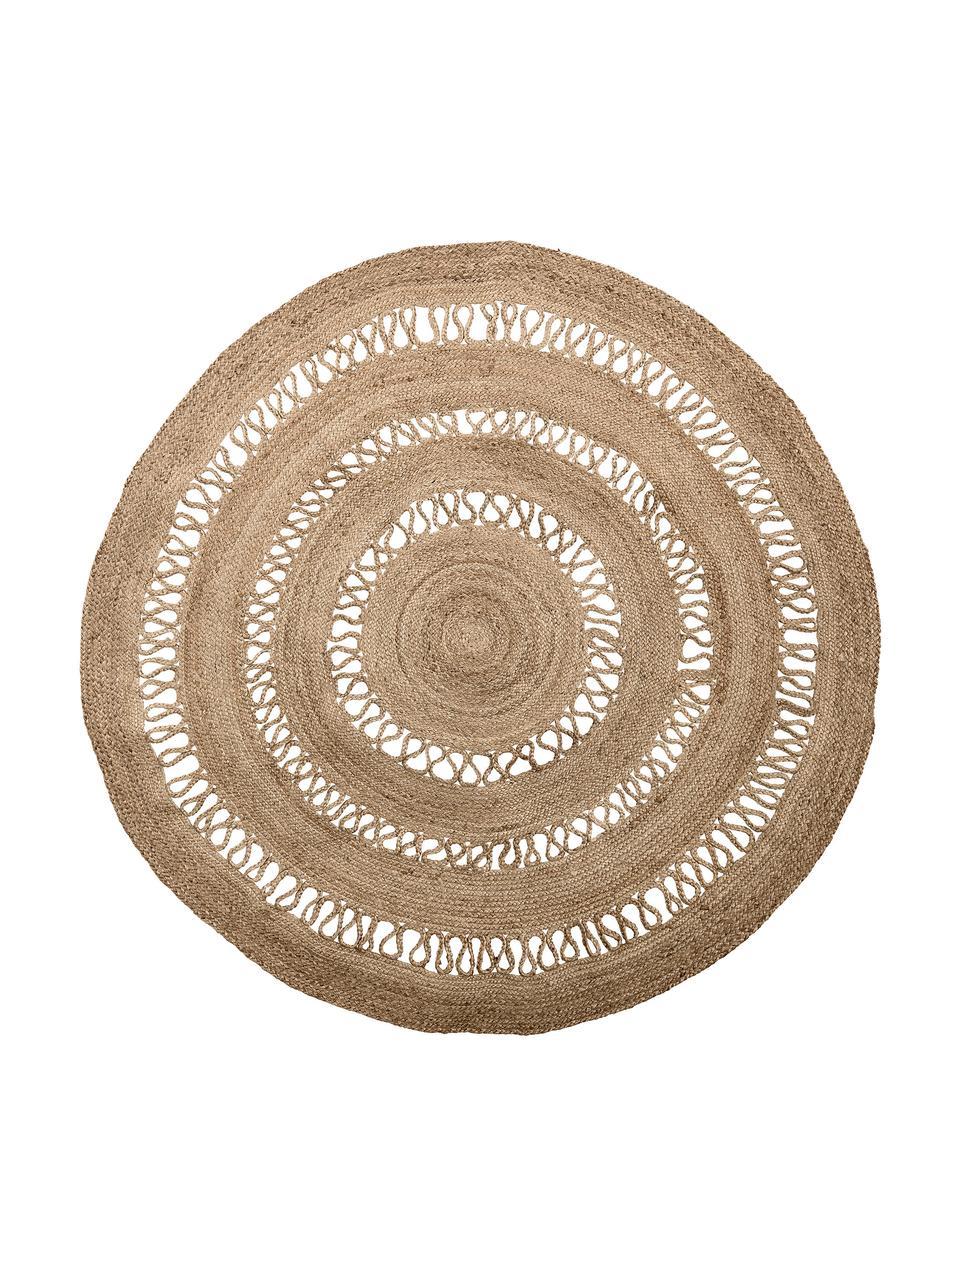 Tappeto rotondo in juta Benita, 100% juta, Juta, Ø 182 cm (taglia L)